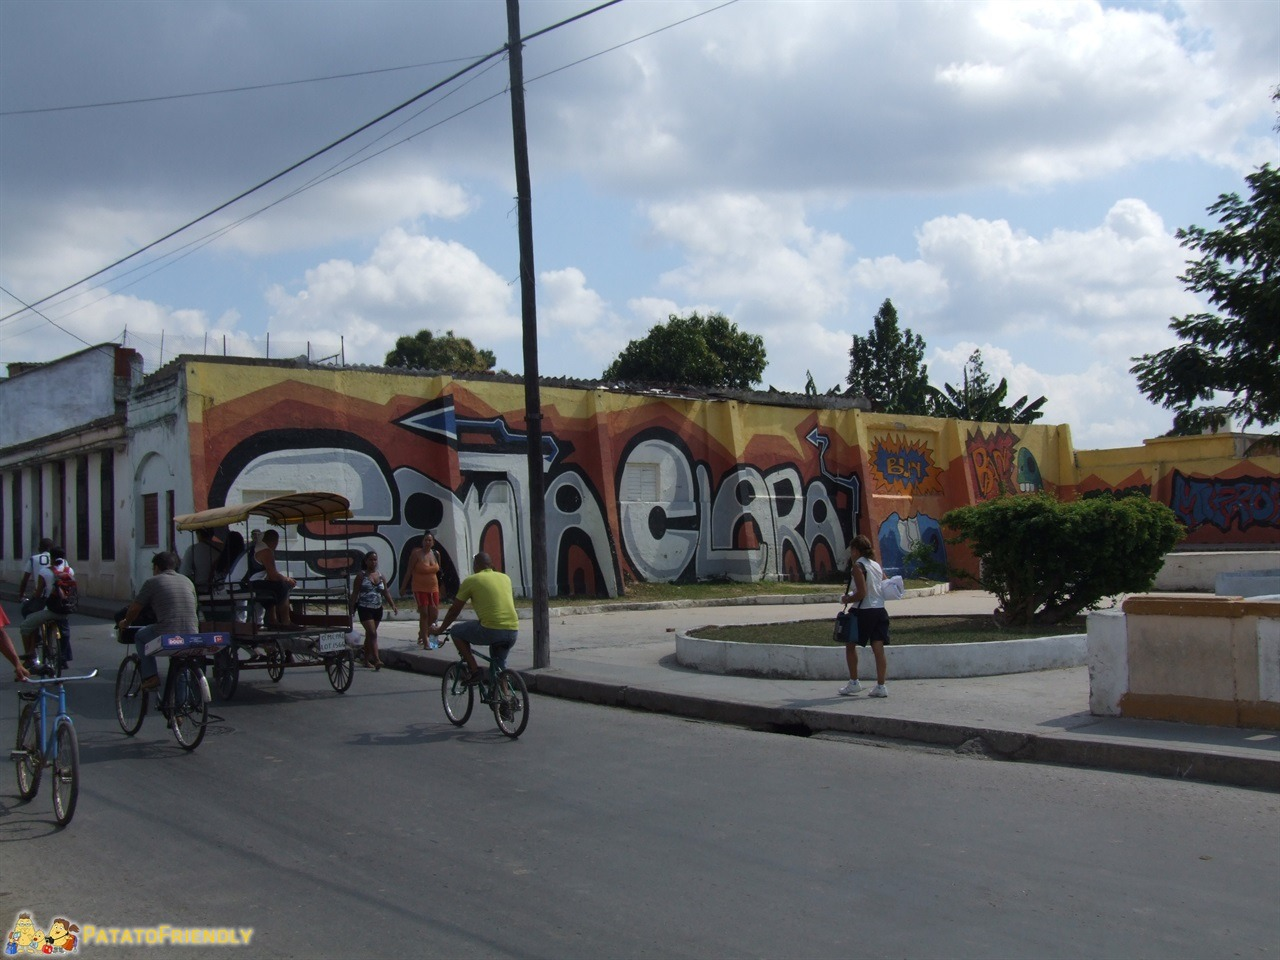 [cml_media_alt id='6713']I viaggi che vorrei rifare - Santa Clara a Cuba[/cml_media_alt]